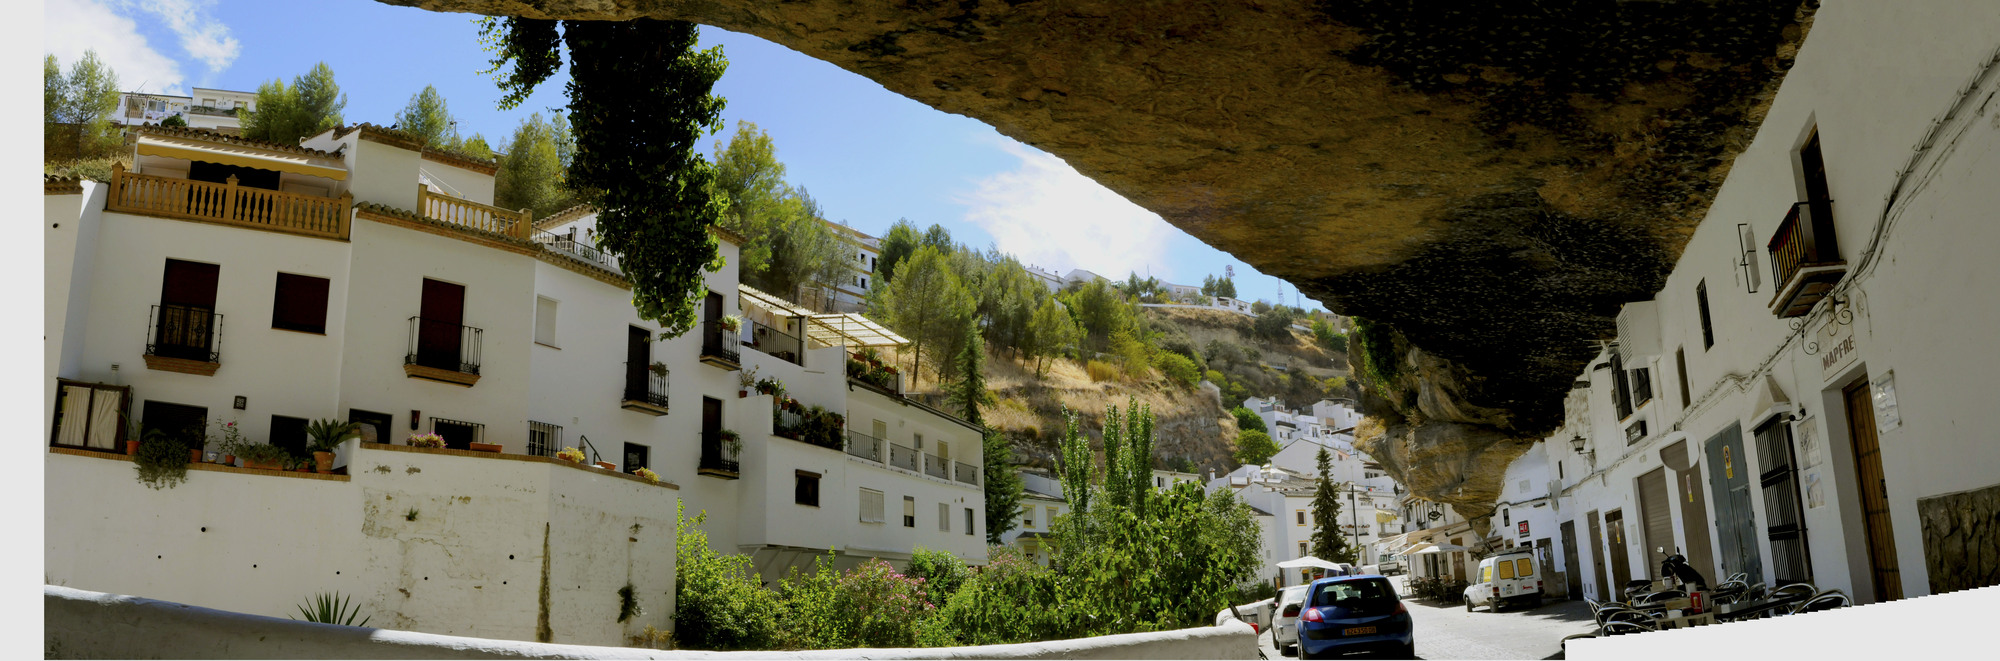 54e4c159e58ece21e0000032_living-under-a-rock-setenil-de-las-bodegas_juanjo